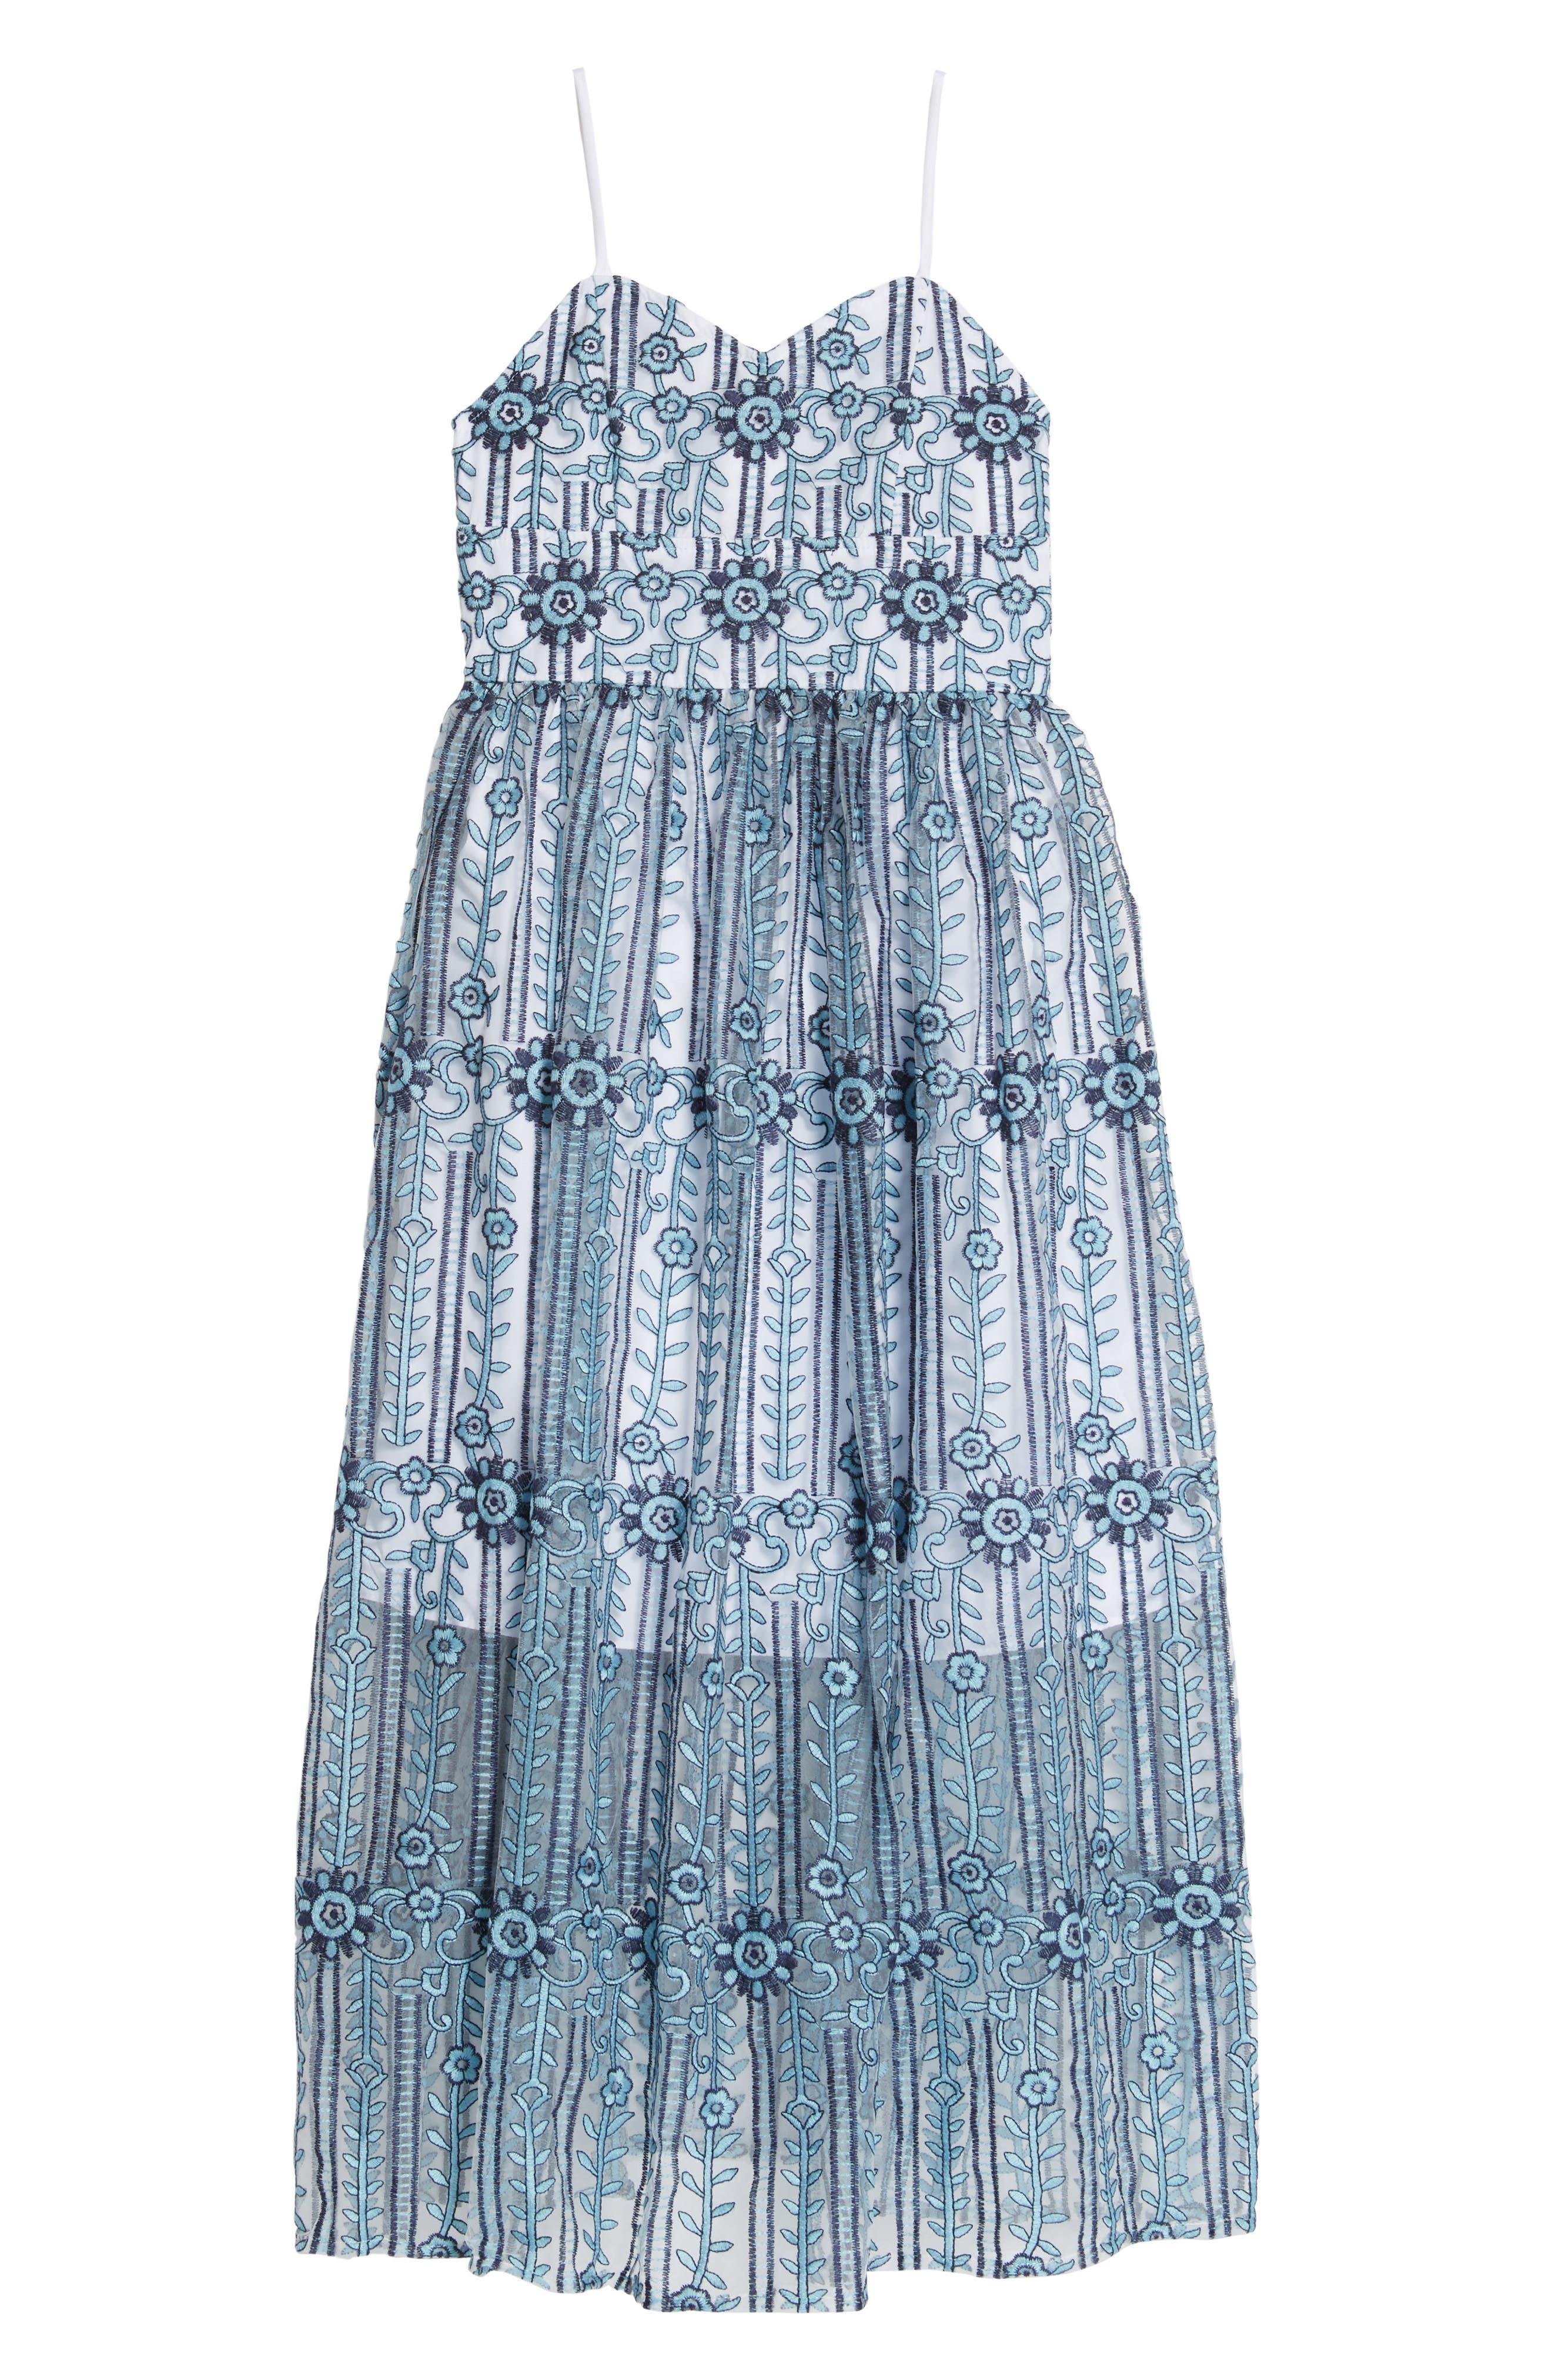 Alternate Image 1 Selected - Pippa & Julie Embroidered Maxi Dress (Big Girls)